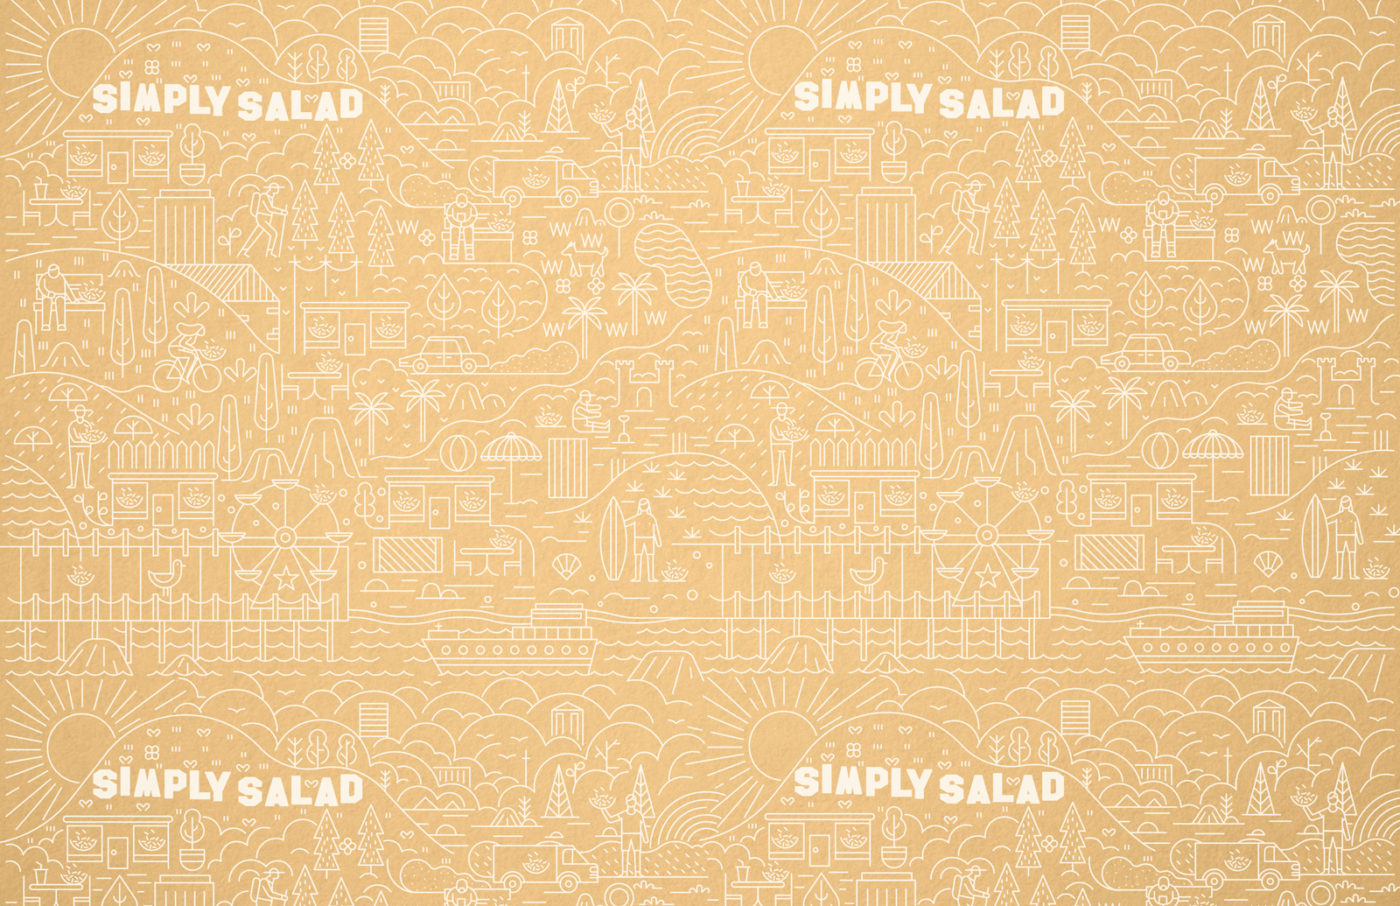 simplysalad_wrap14x14_combowhitewfill